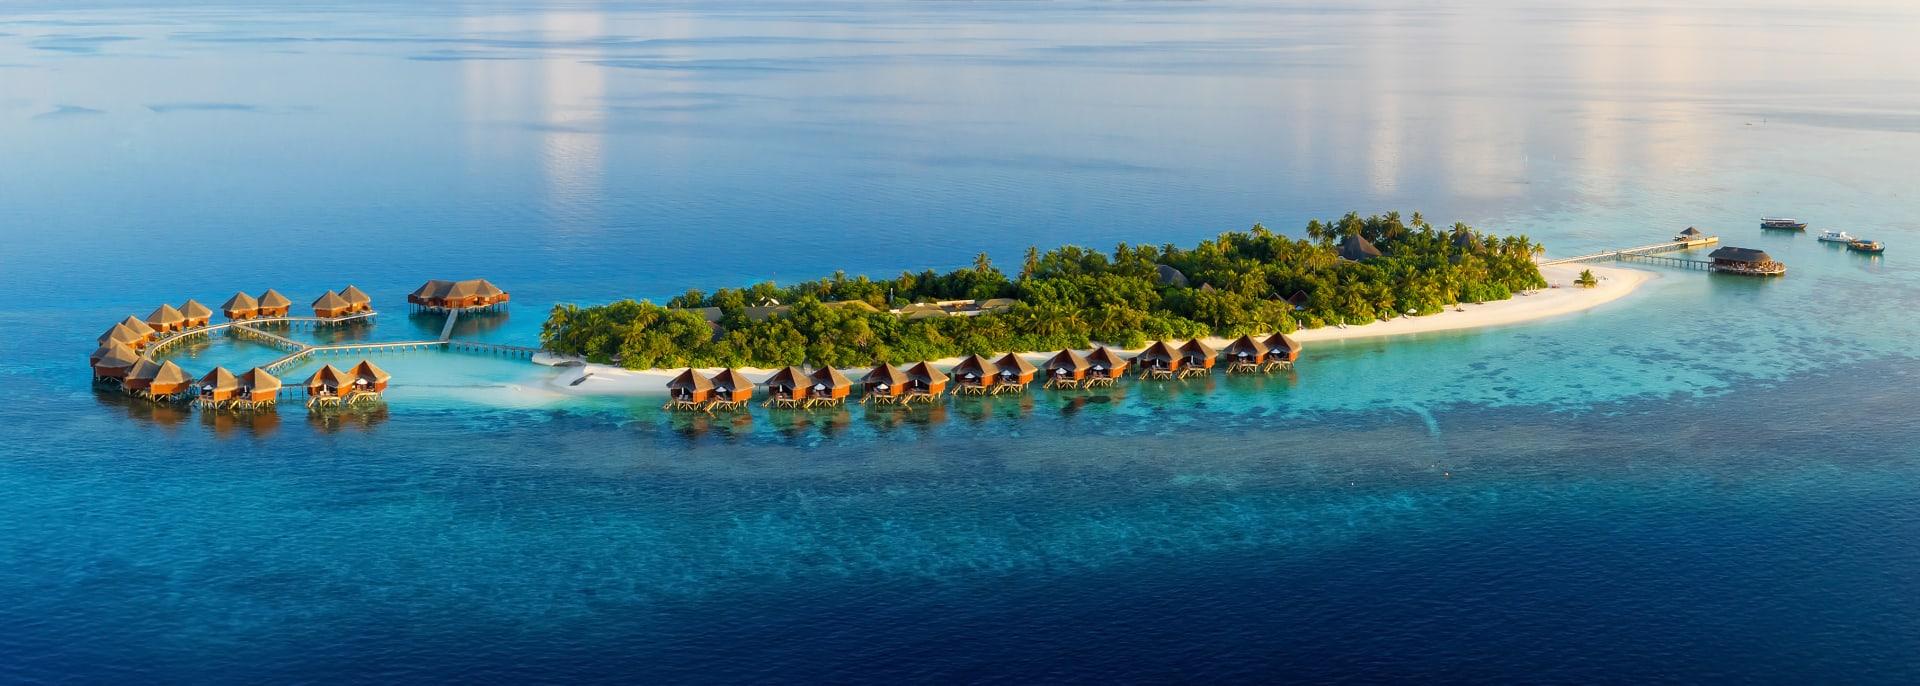 Insel, Malediven